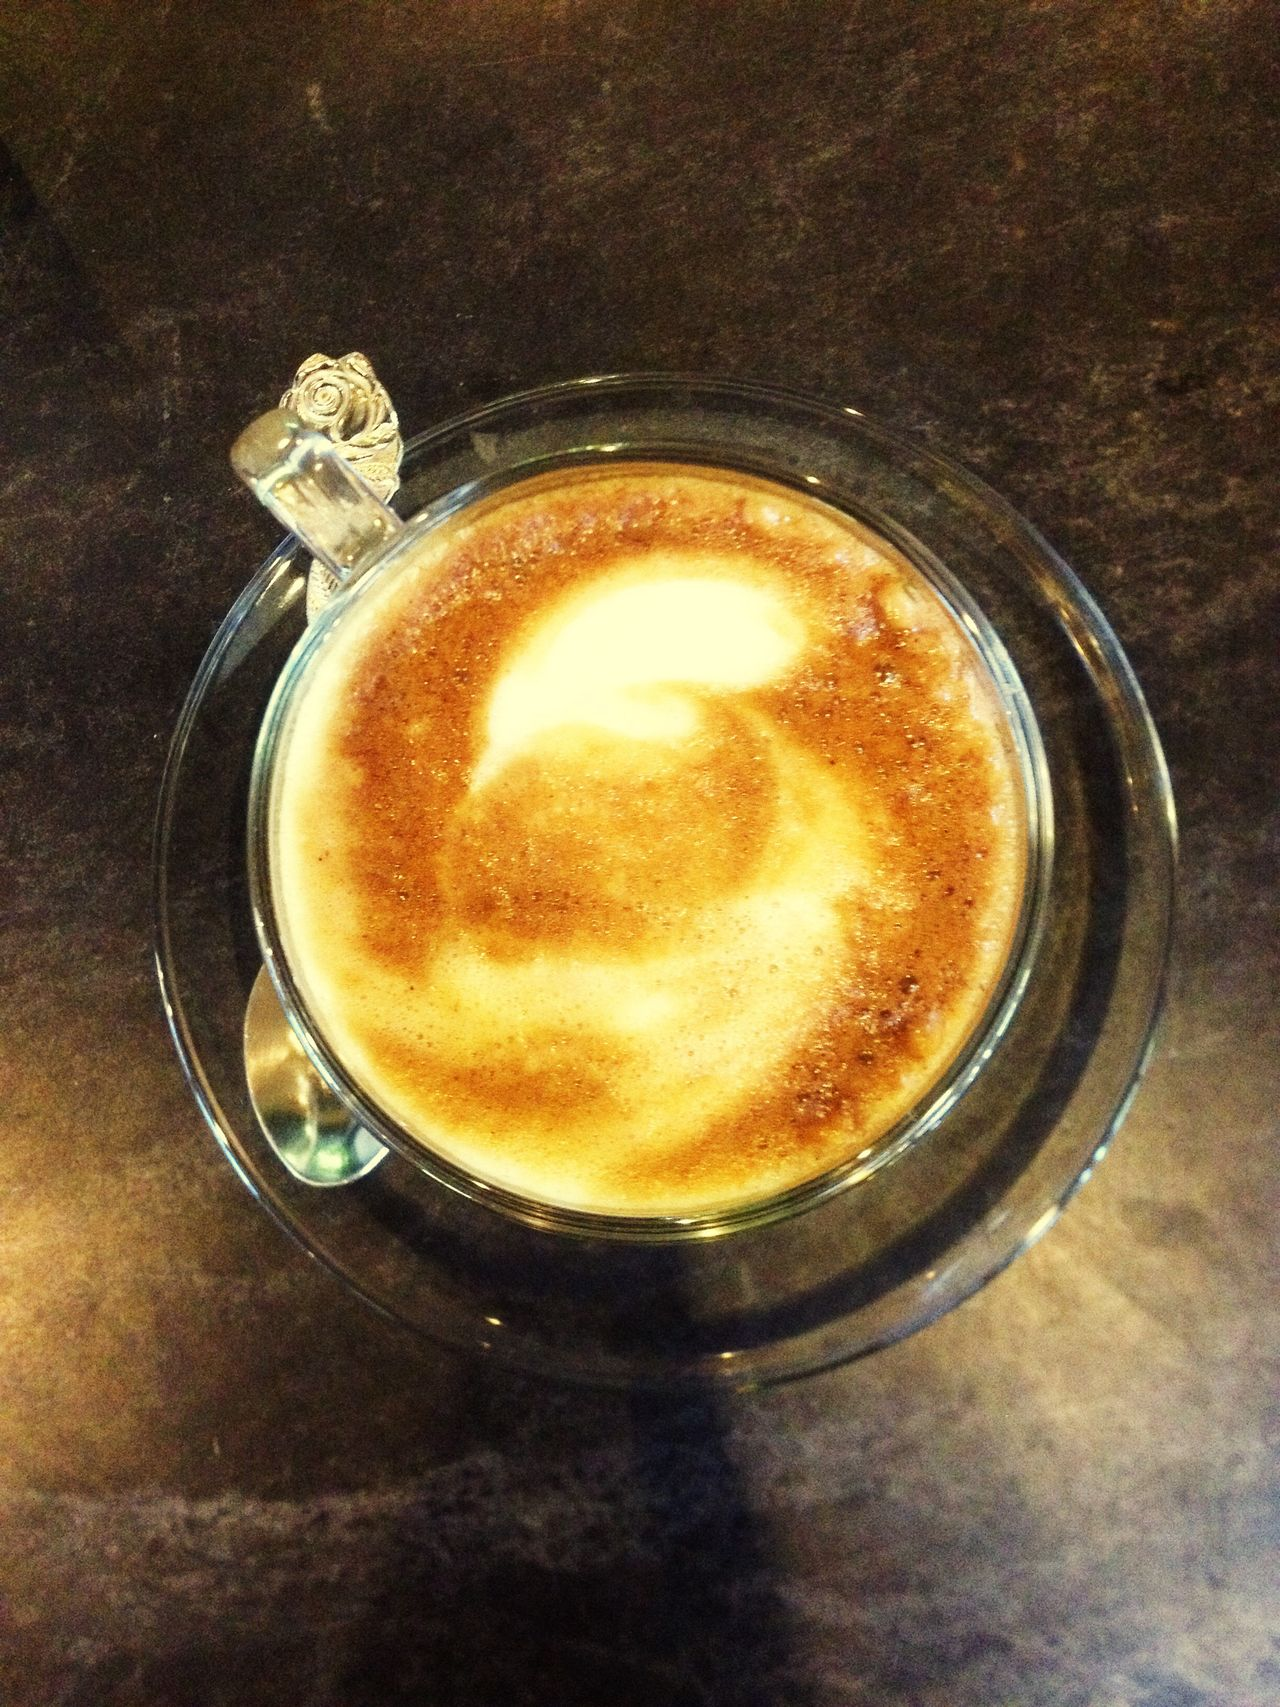 Coffee art Coffee Coffee Time Coffee Break Capuccino Lateart Espresso Hotcoffee Hotchocolate Coffee And Sweets Coffee Shop Coffee Cup Cup Coffeelover Coffee - Drink Coffee Art Chiangmai Thailand